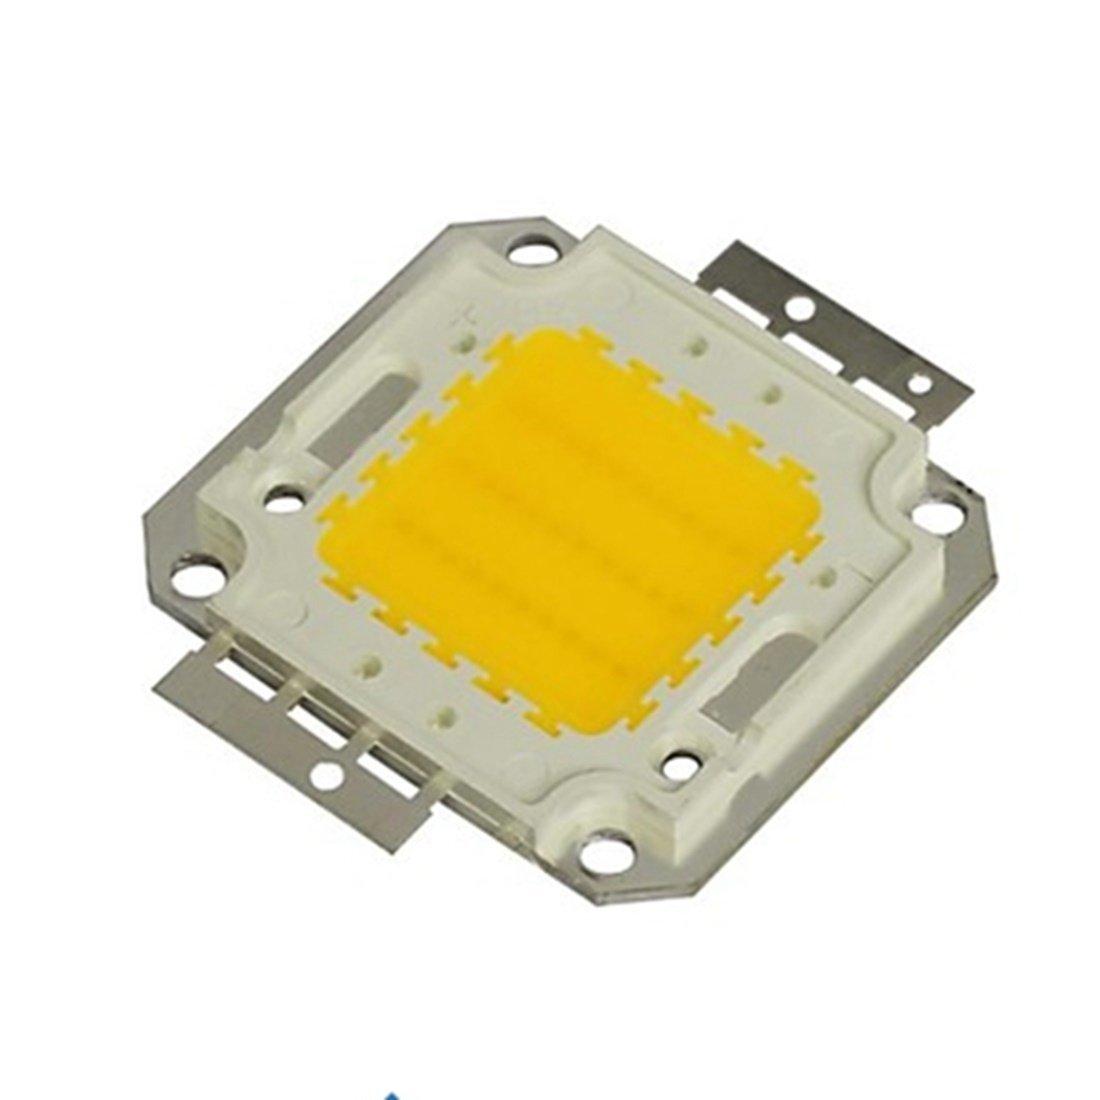 SRY-LED Bulbs High Power LED Chip Beads COB Beads 20W 30W 50W 70W 100W 3000K/6000K For Floodlight Spotlight Energy saving (Color : Warm white, Wattage : 30W)